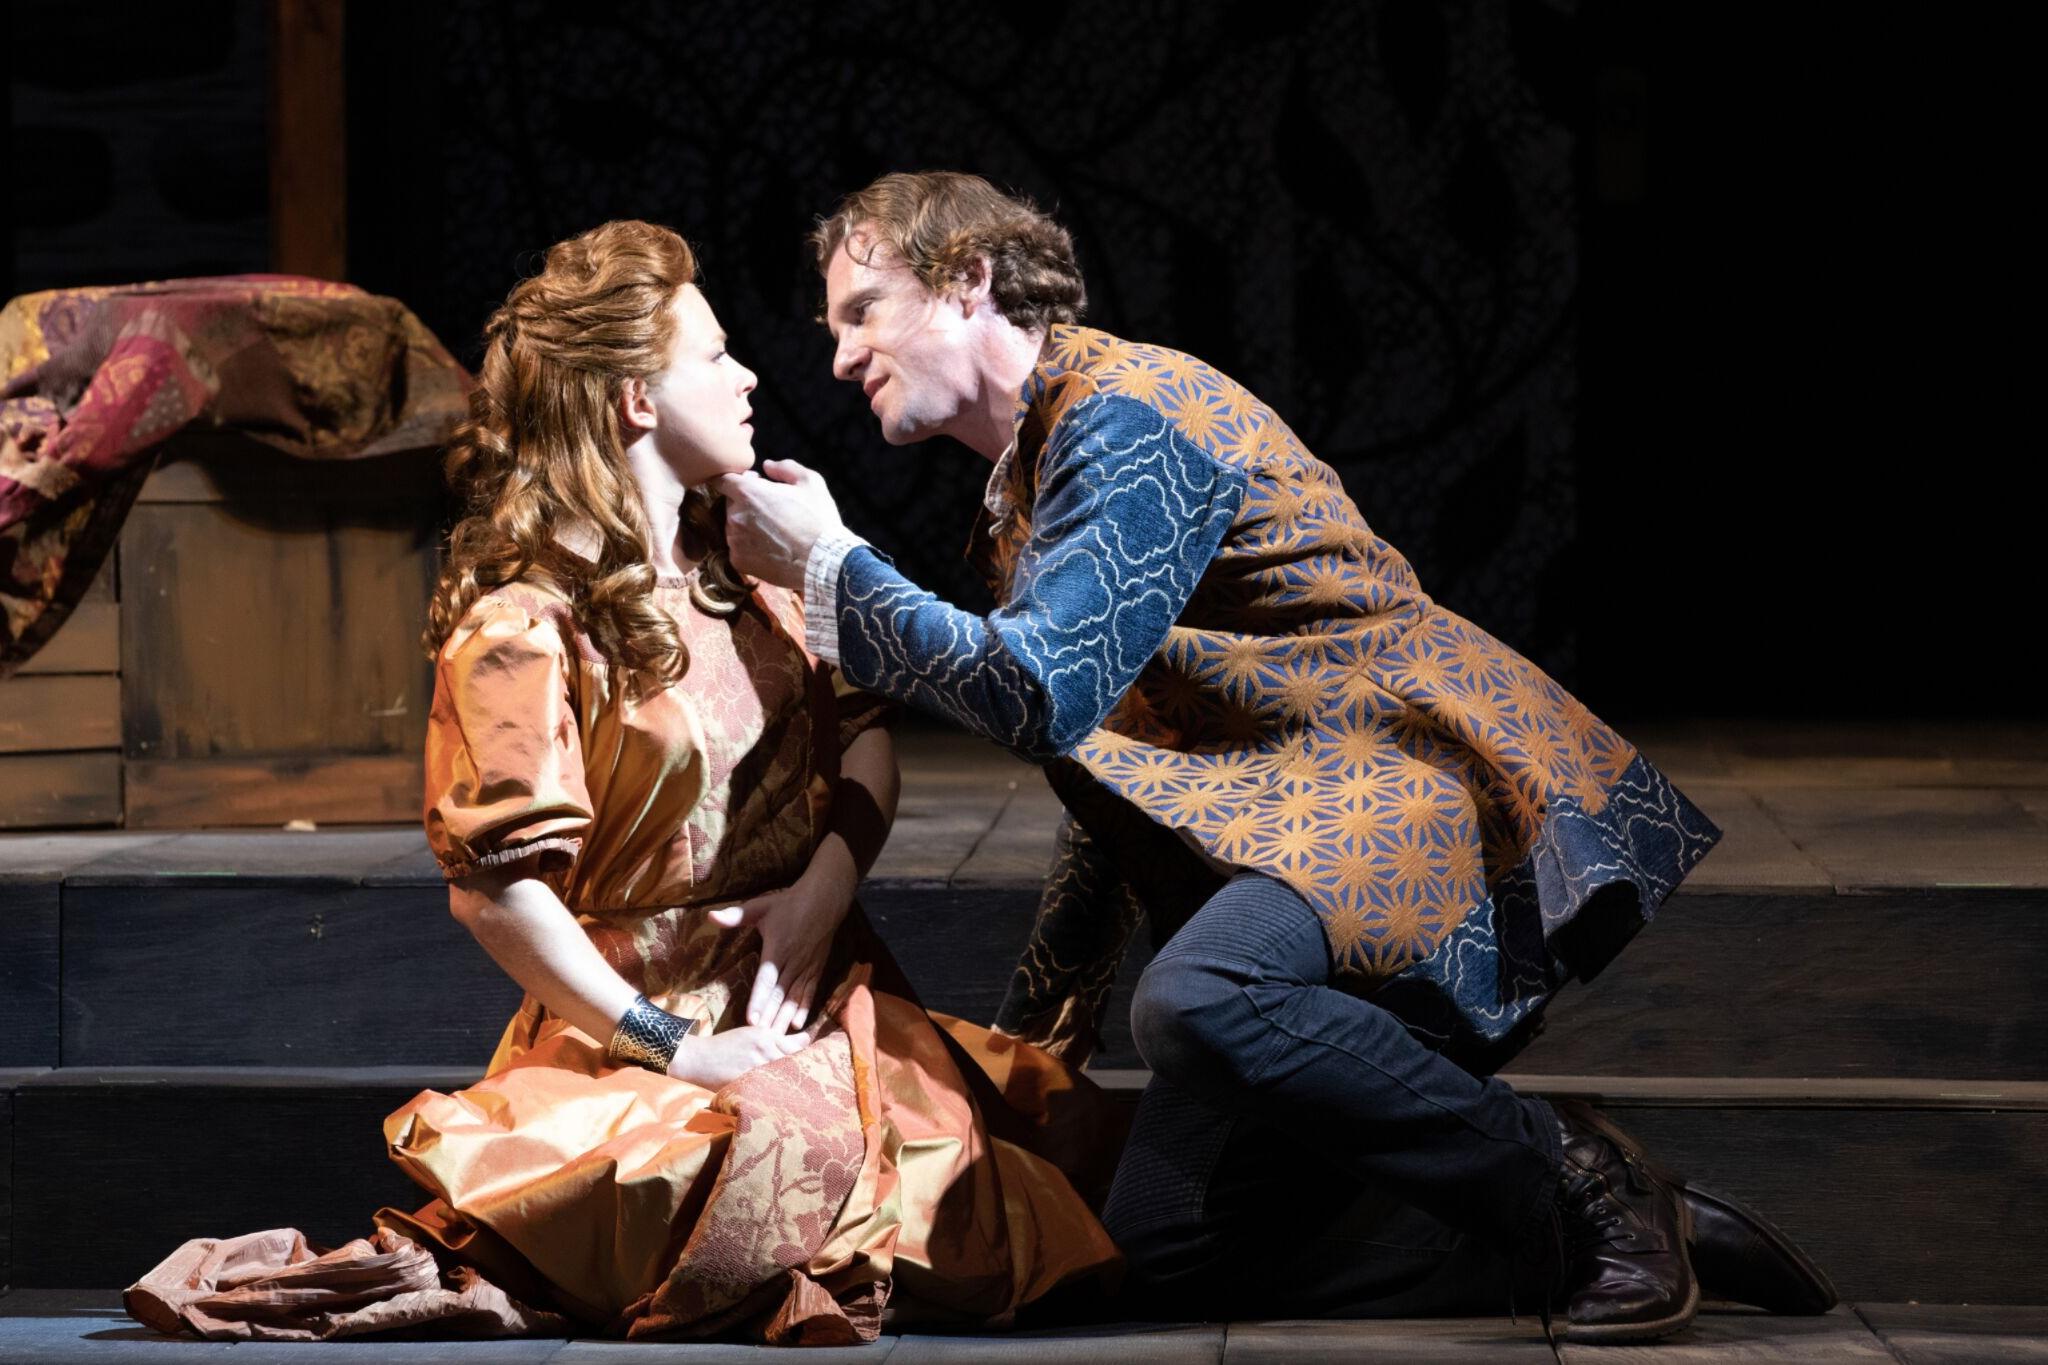 Nora Eschenheimer ( Imogen) and Jesse Hinson (Iachimo) in Cymbeline, Shakespeare on the Common 2019-Photo by Evgenia Eliseeva